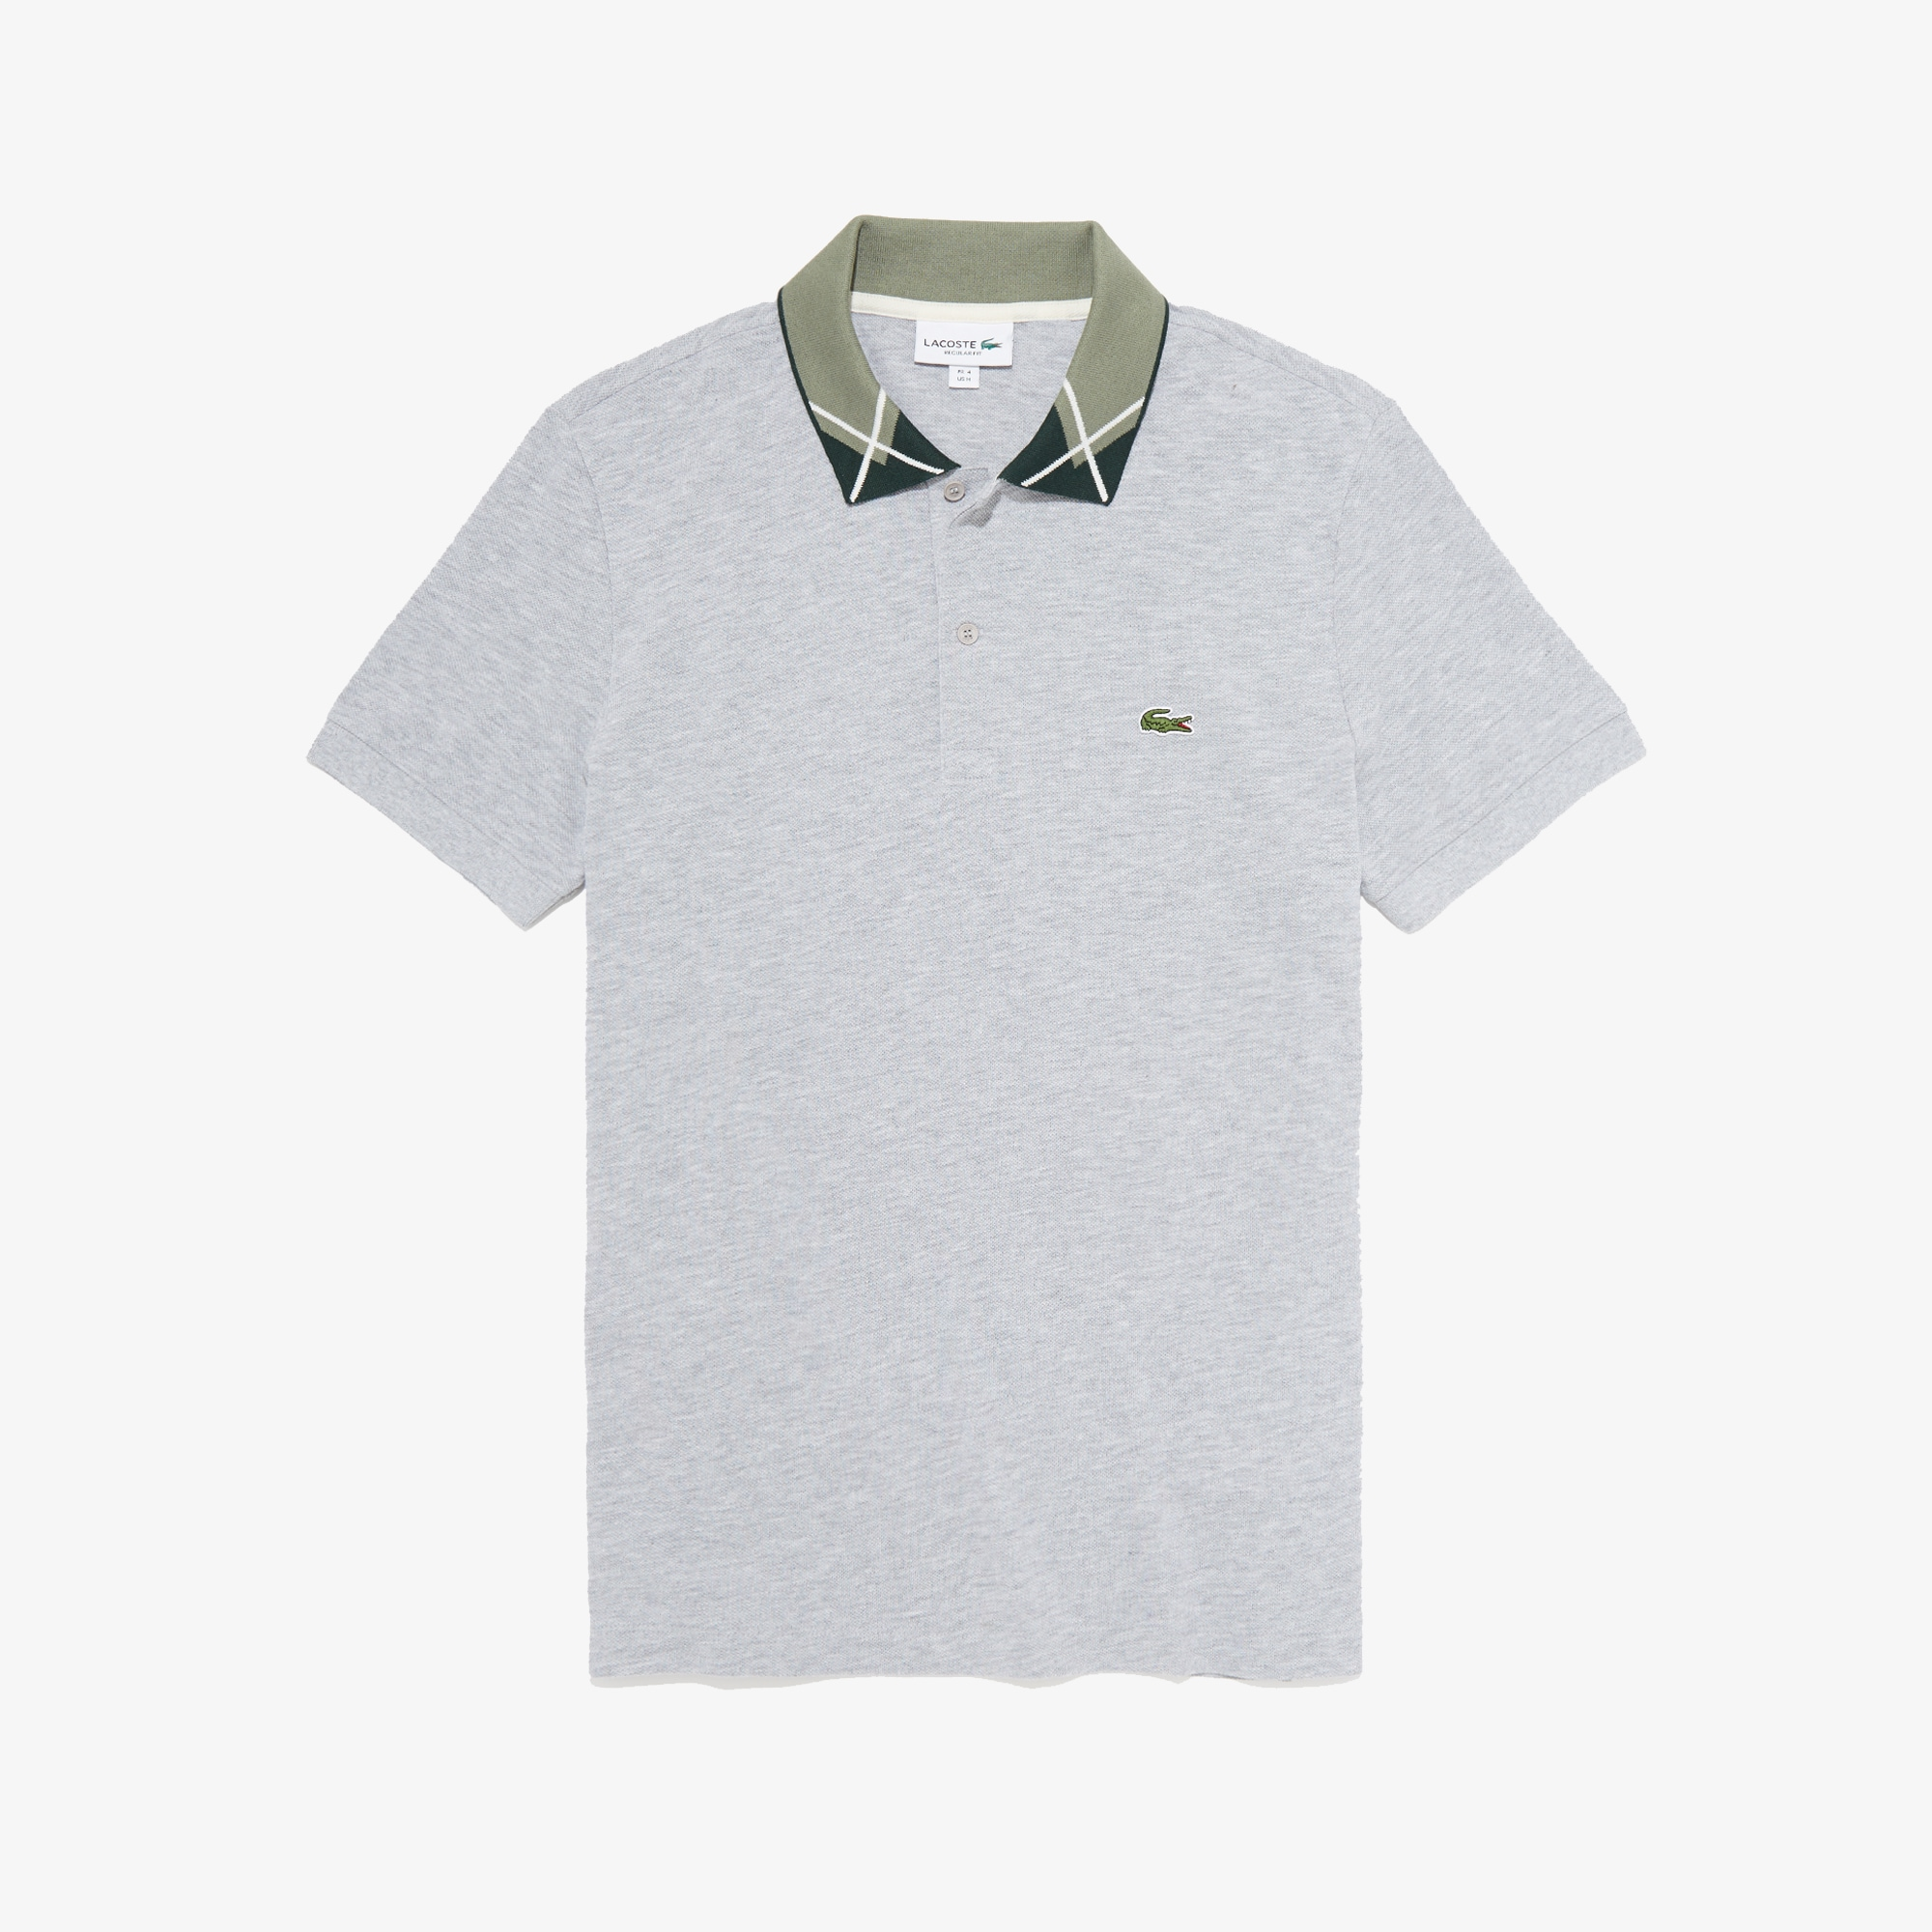 Lacoste Tops Men's Regular Fit Jacquard-Collar Cotton Piqué Polo Shirt